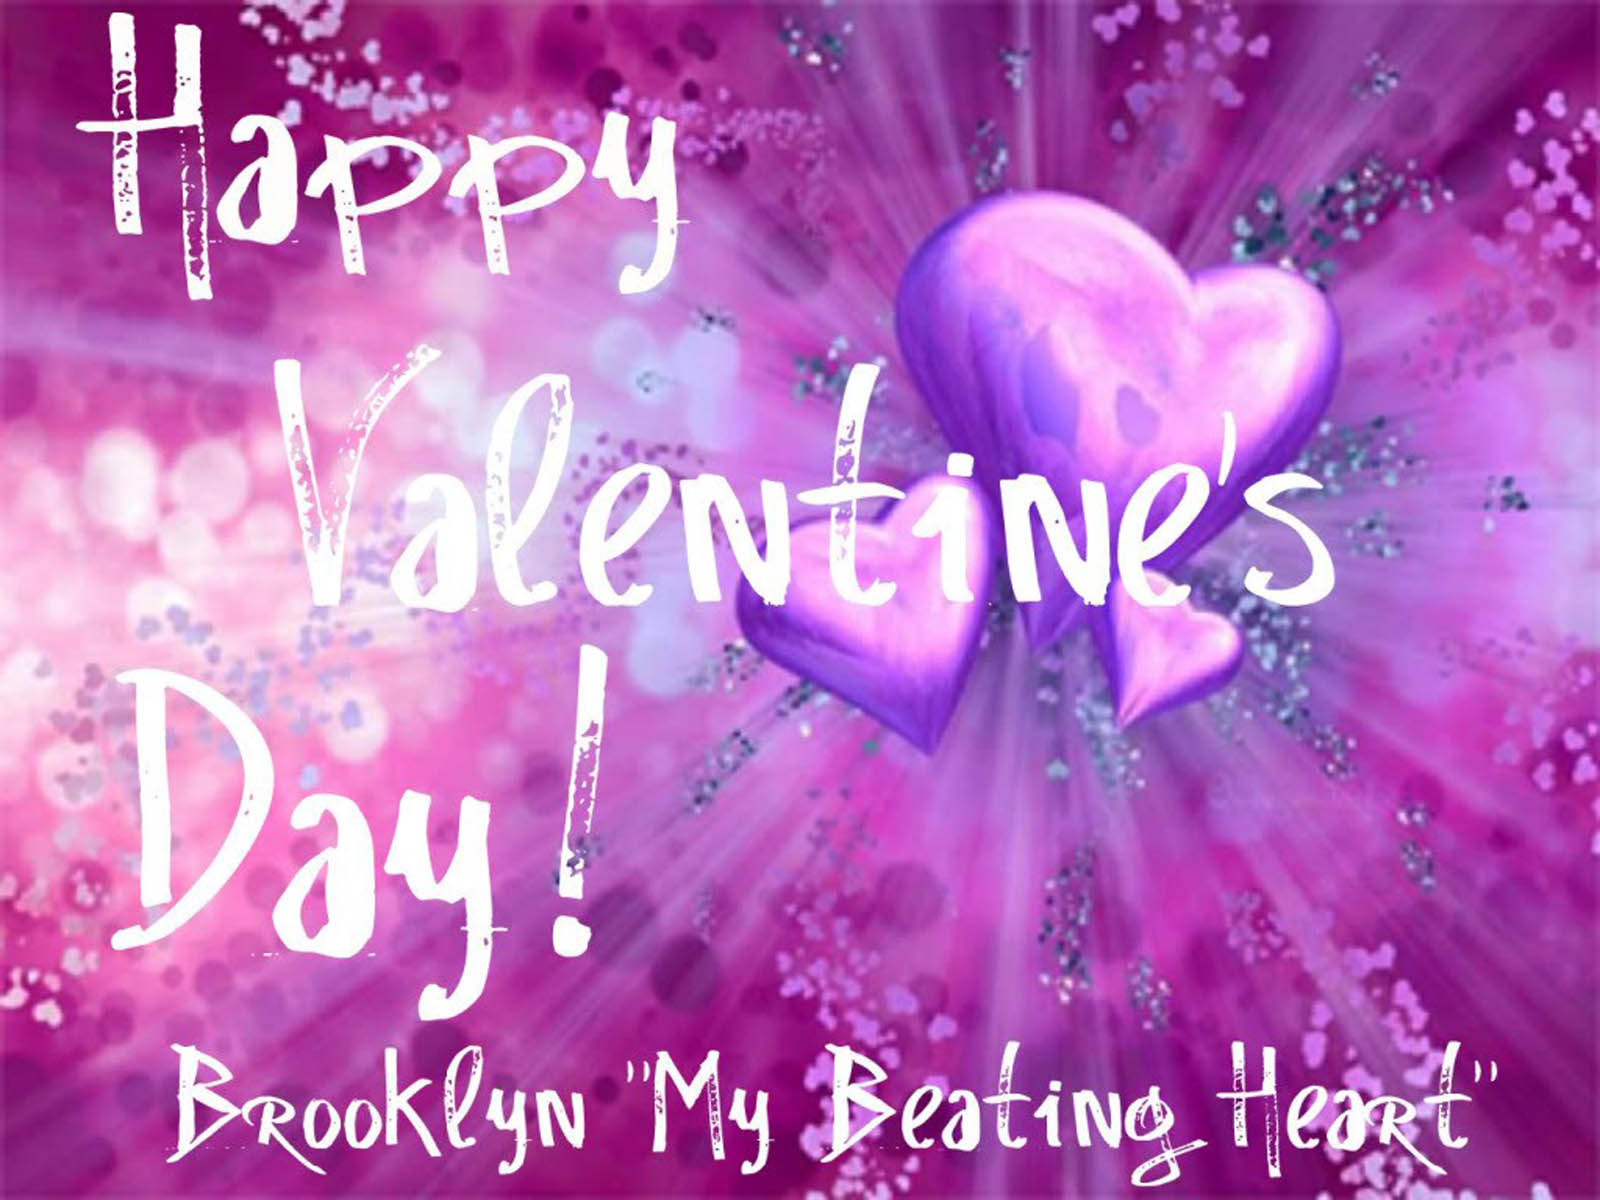 day desktop wallpapers valentines - photo #25